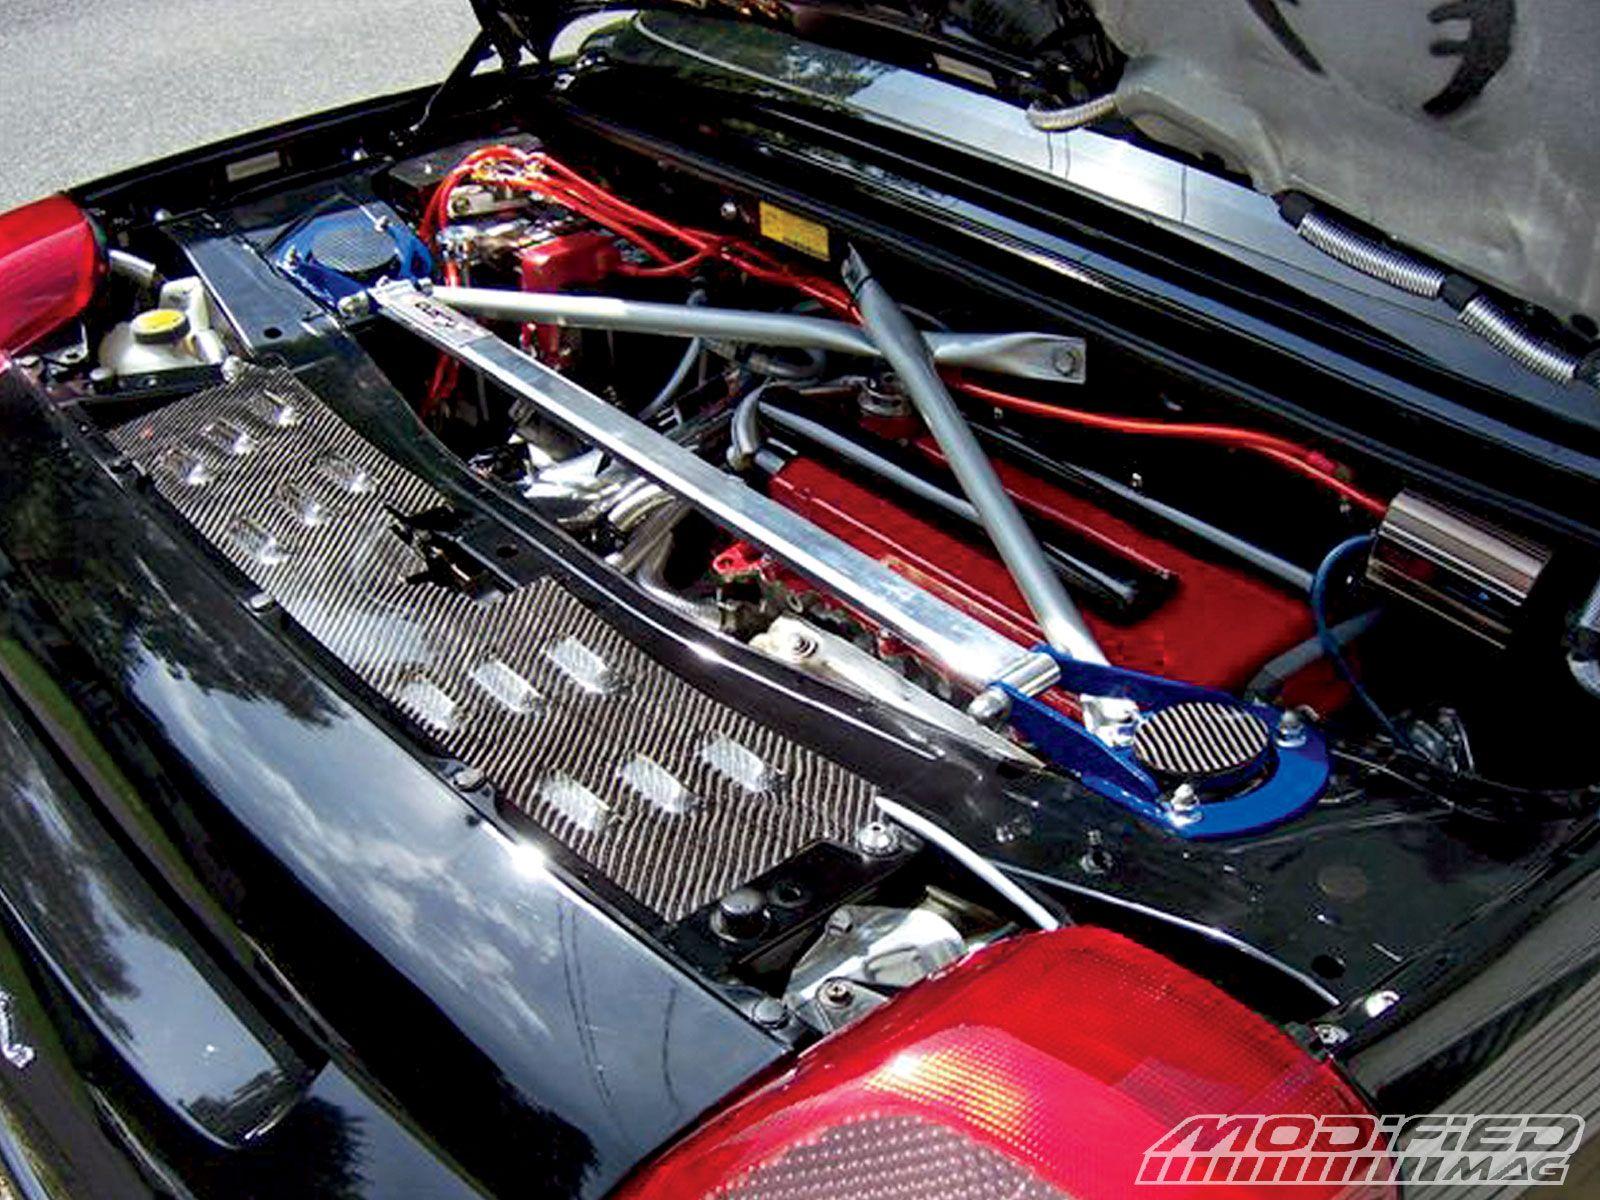 Toyota mr2 spyder 2647238 car garage toyota toyota mr2 cars for Mr2 spyder interior accessories